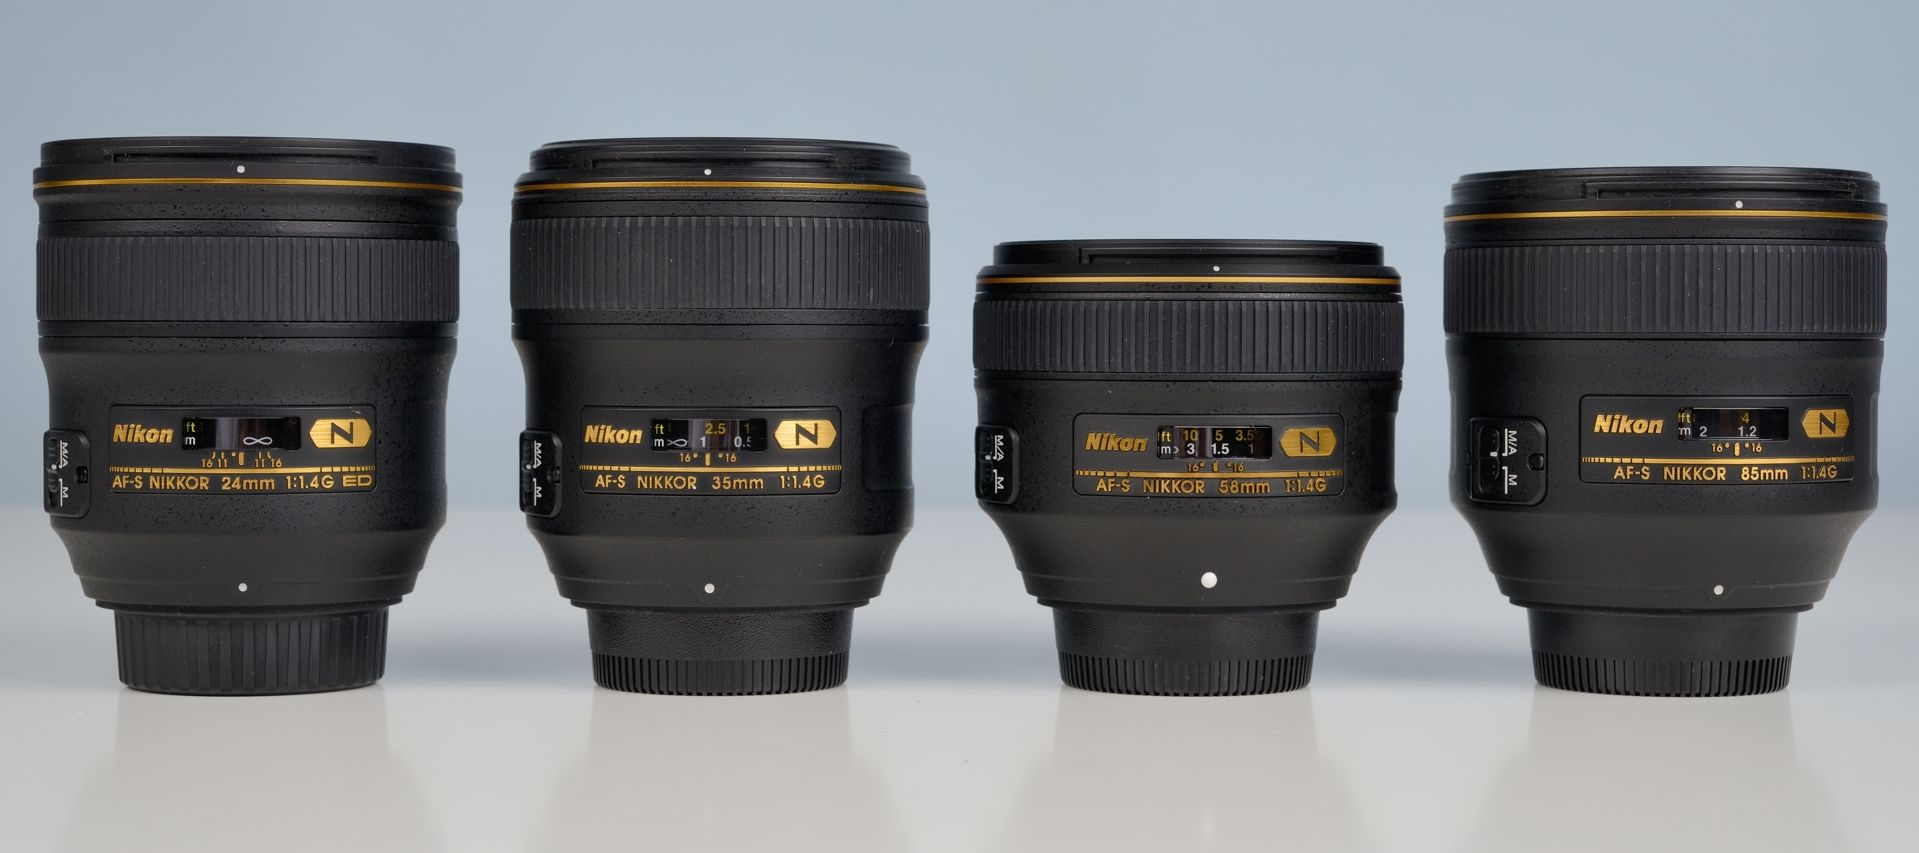 Nikon 24 35 58 85 Mm F 1 4g N Lenses Nikon Photography Lenses Camera Lens